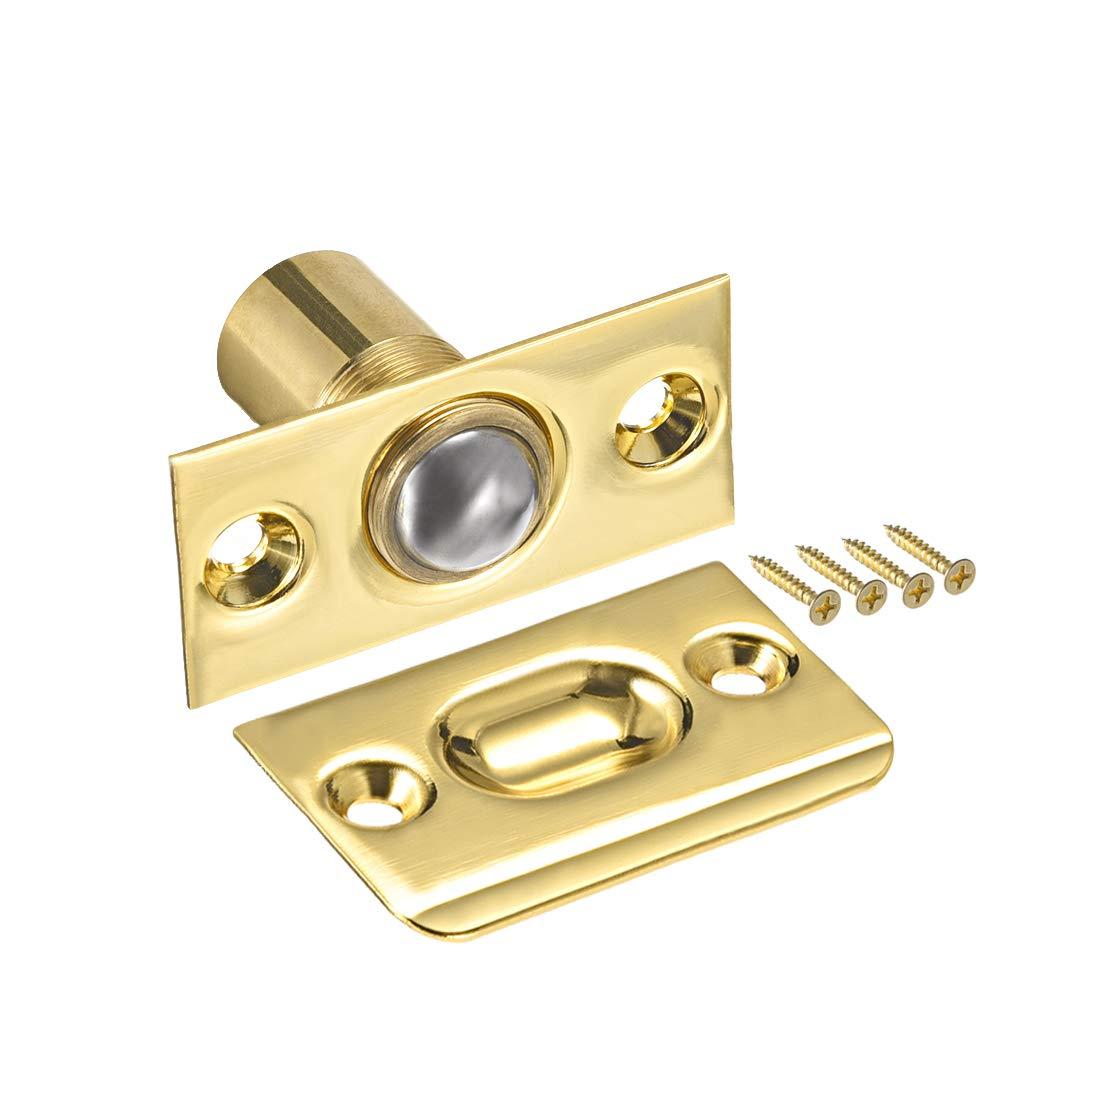 uxcell Adjustable Cabinet Closet Door Large Ball Catch w Strike Screws 54mm Length Brass Plated 2pcs